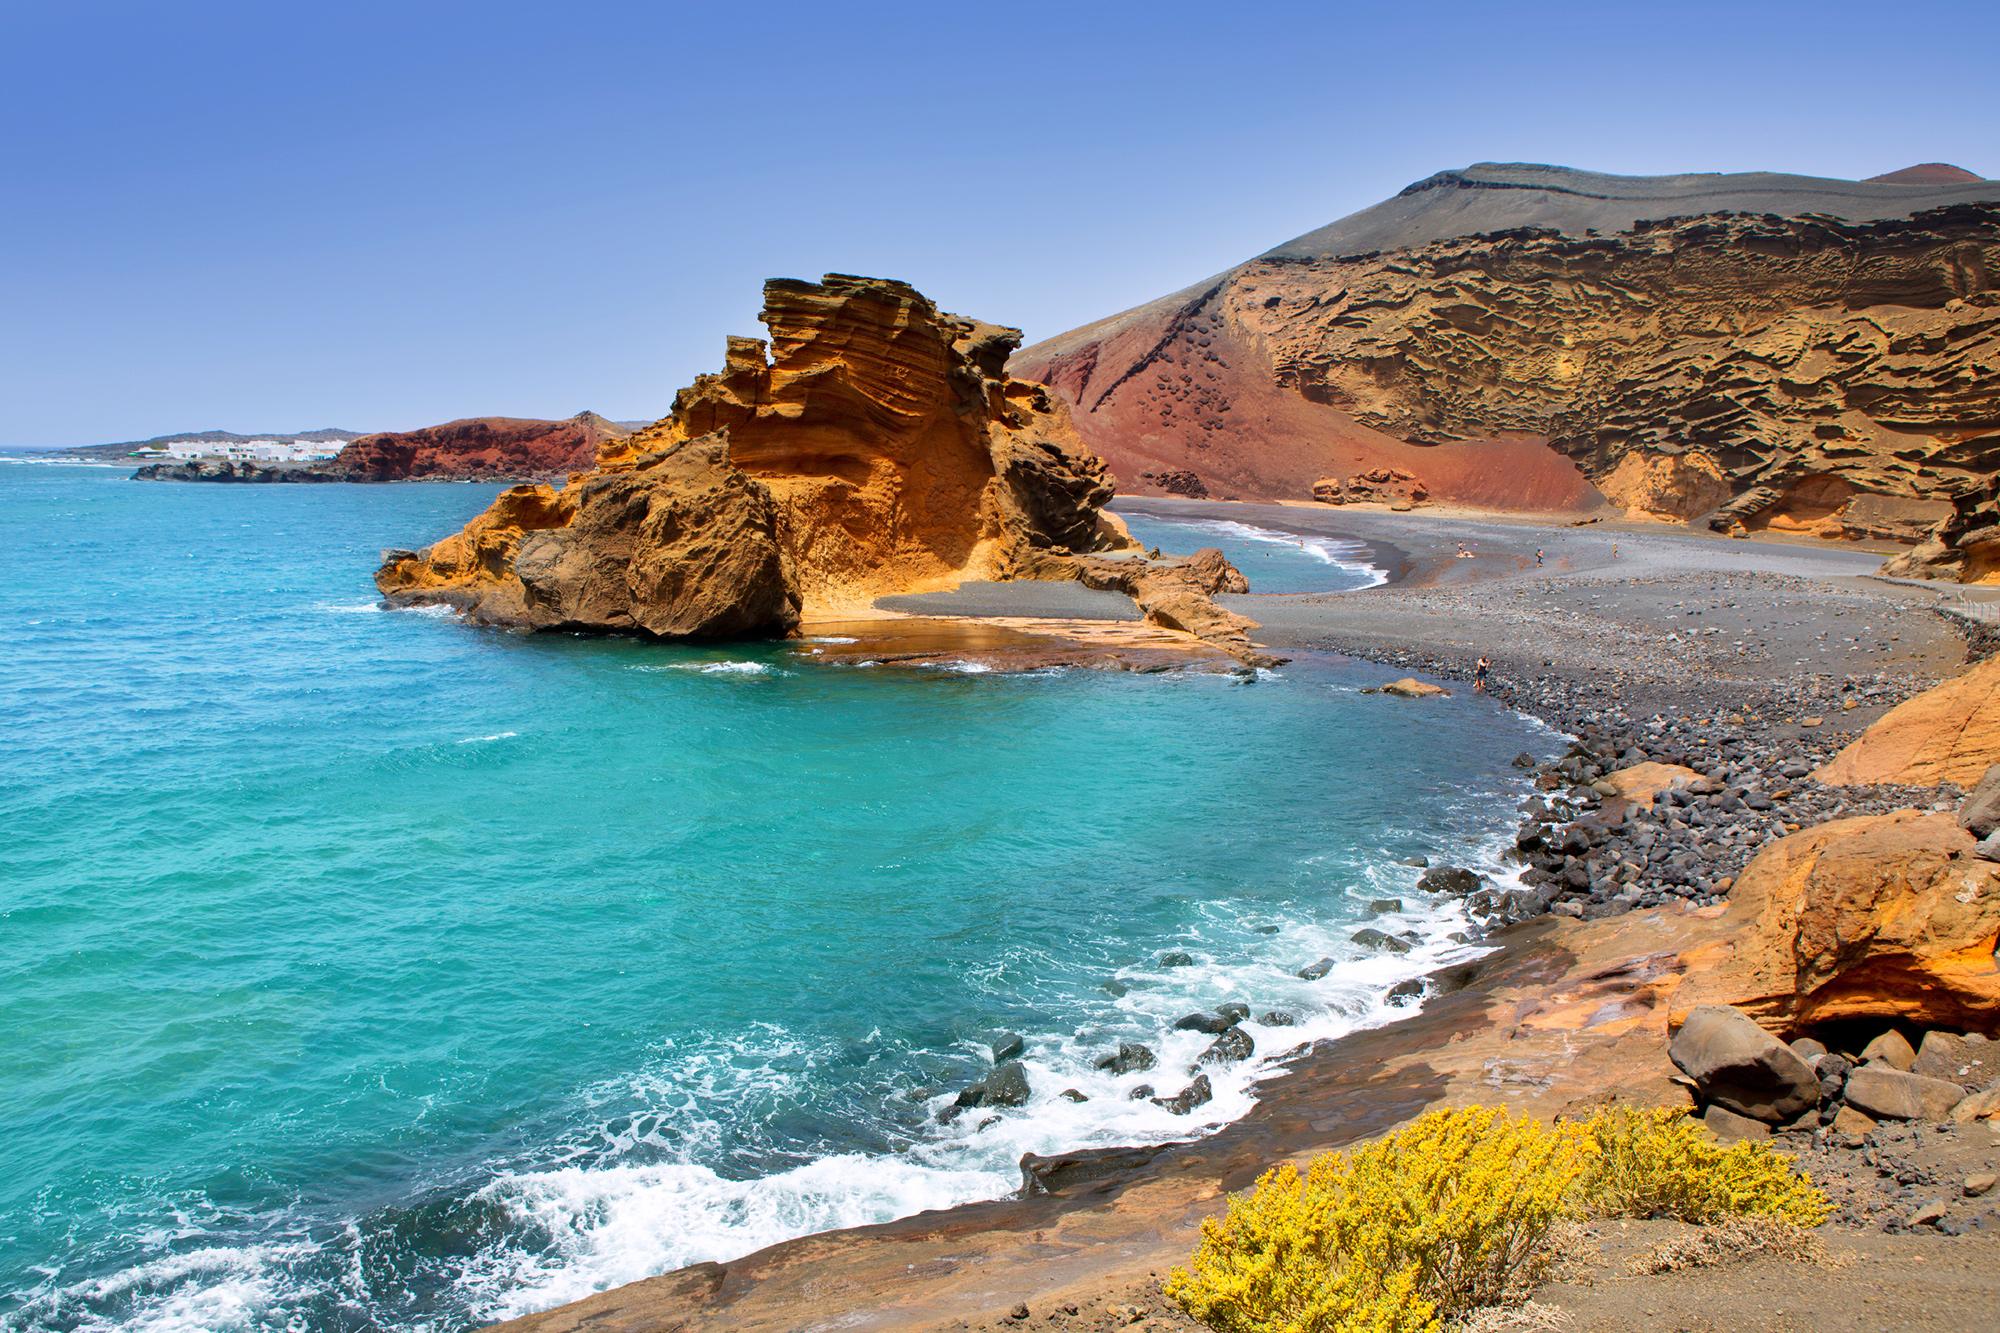 Flüge: Lufthansa FRA-TFS/LPA (Teneriffa/Gran Canaria) Dez-Jan // andere Abflughäfen 0-60€ Aufpreis